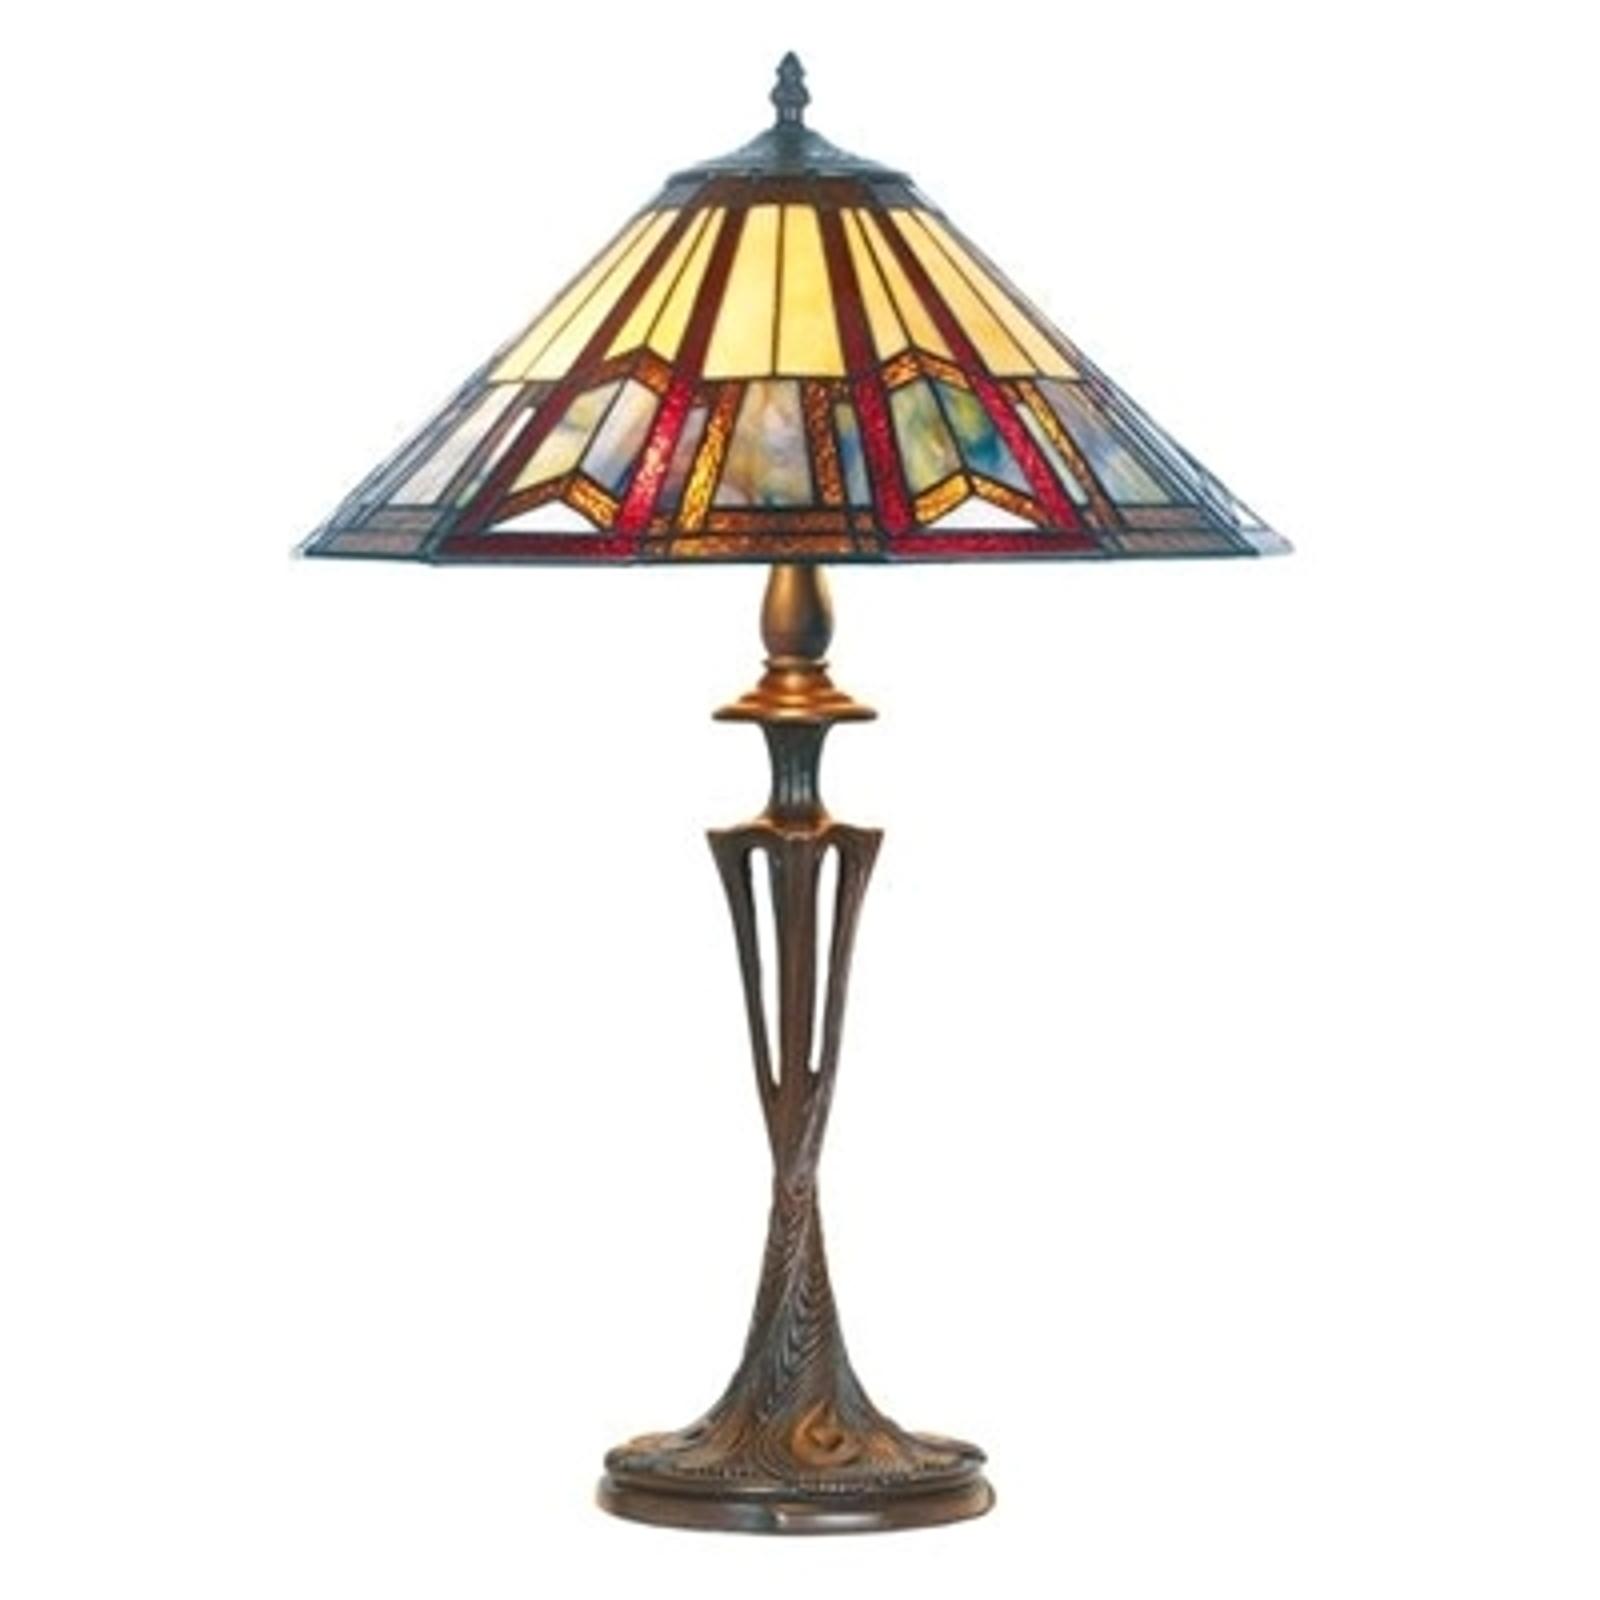 Tafellamp Lillie in Tiffany-stijl